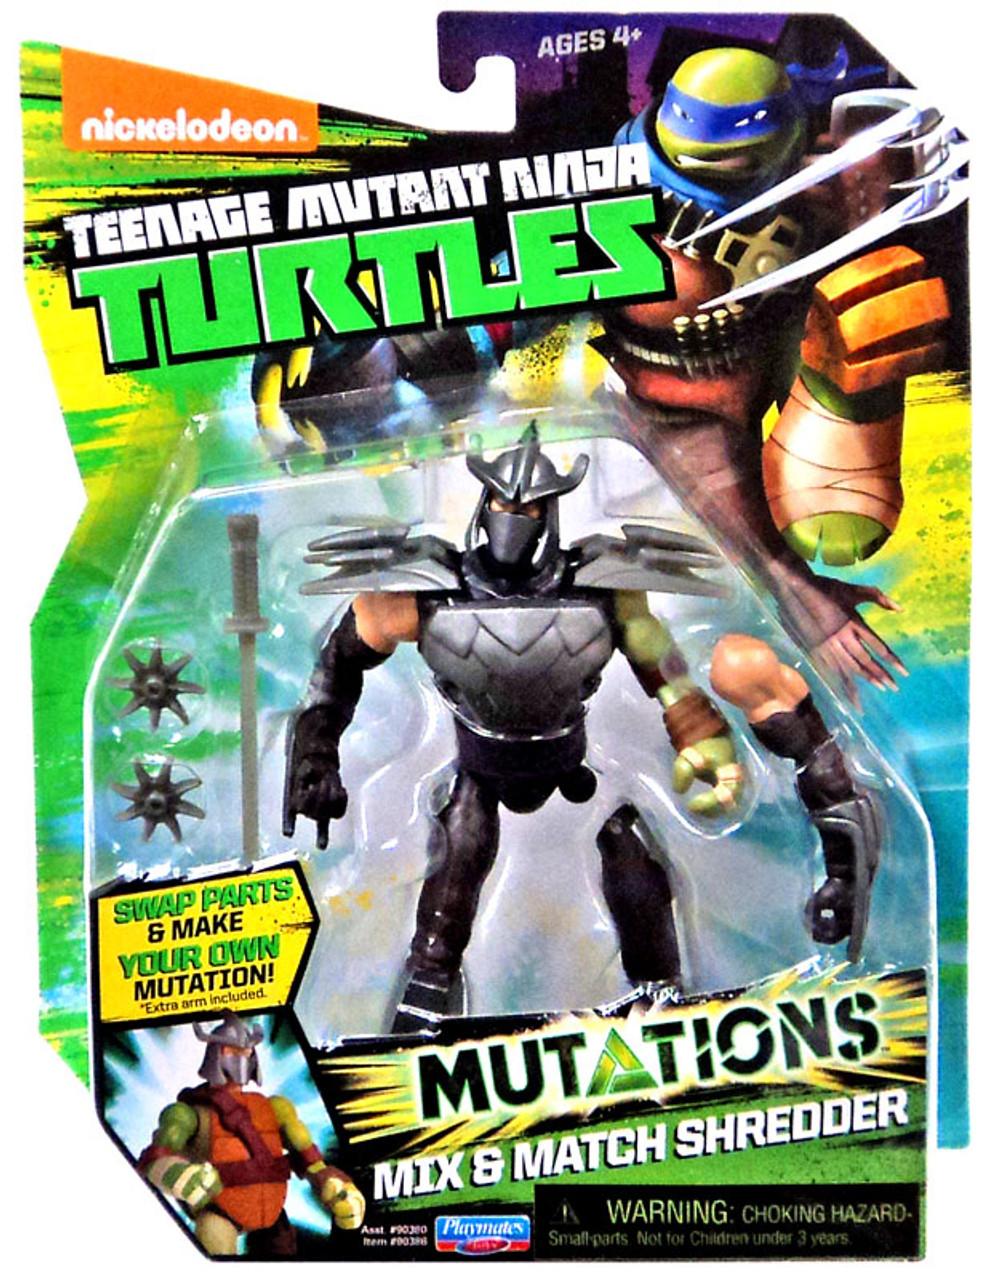 Teenage Mutant Ninja Turtles Nickelodeon Mutations Mix Match